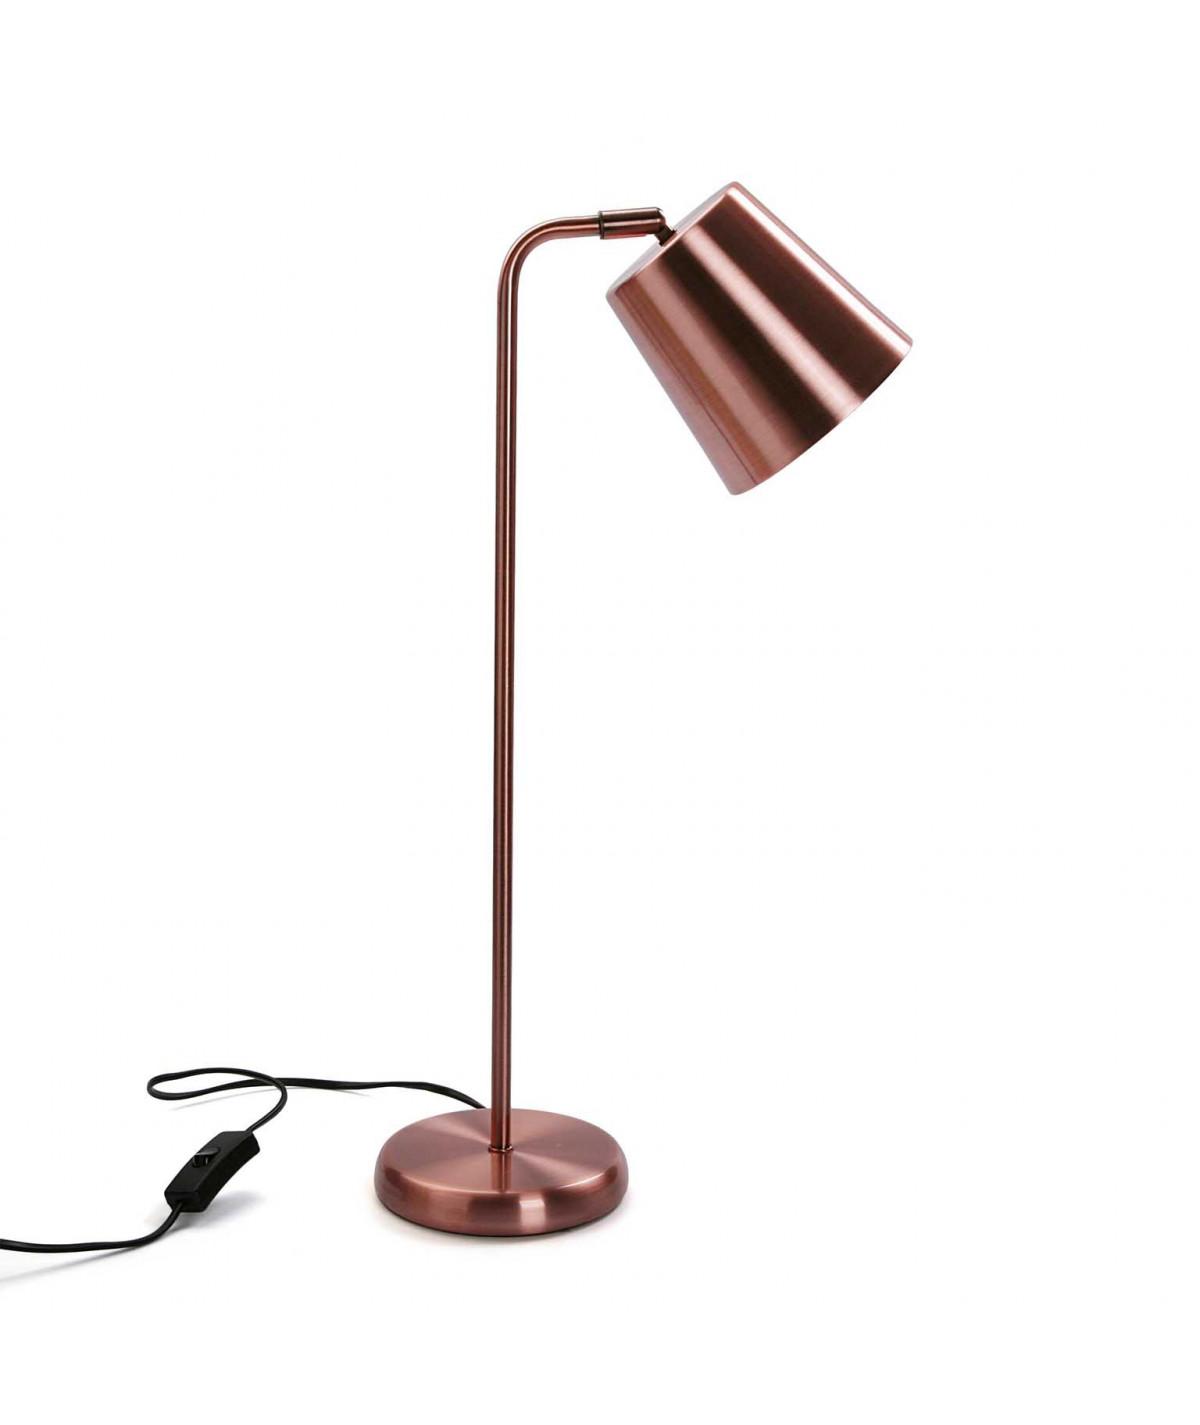 Lampe à poser effet cuivré - Gustavia  YESDEKO